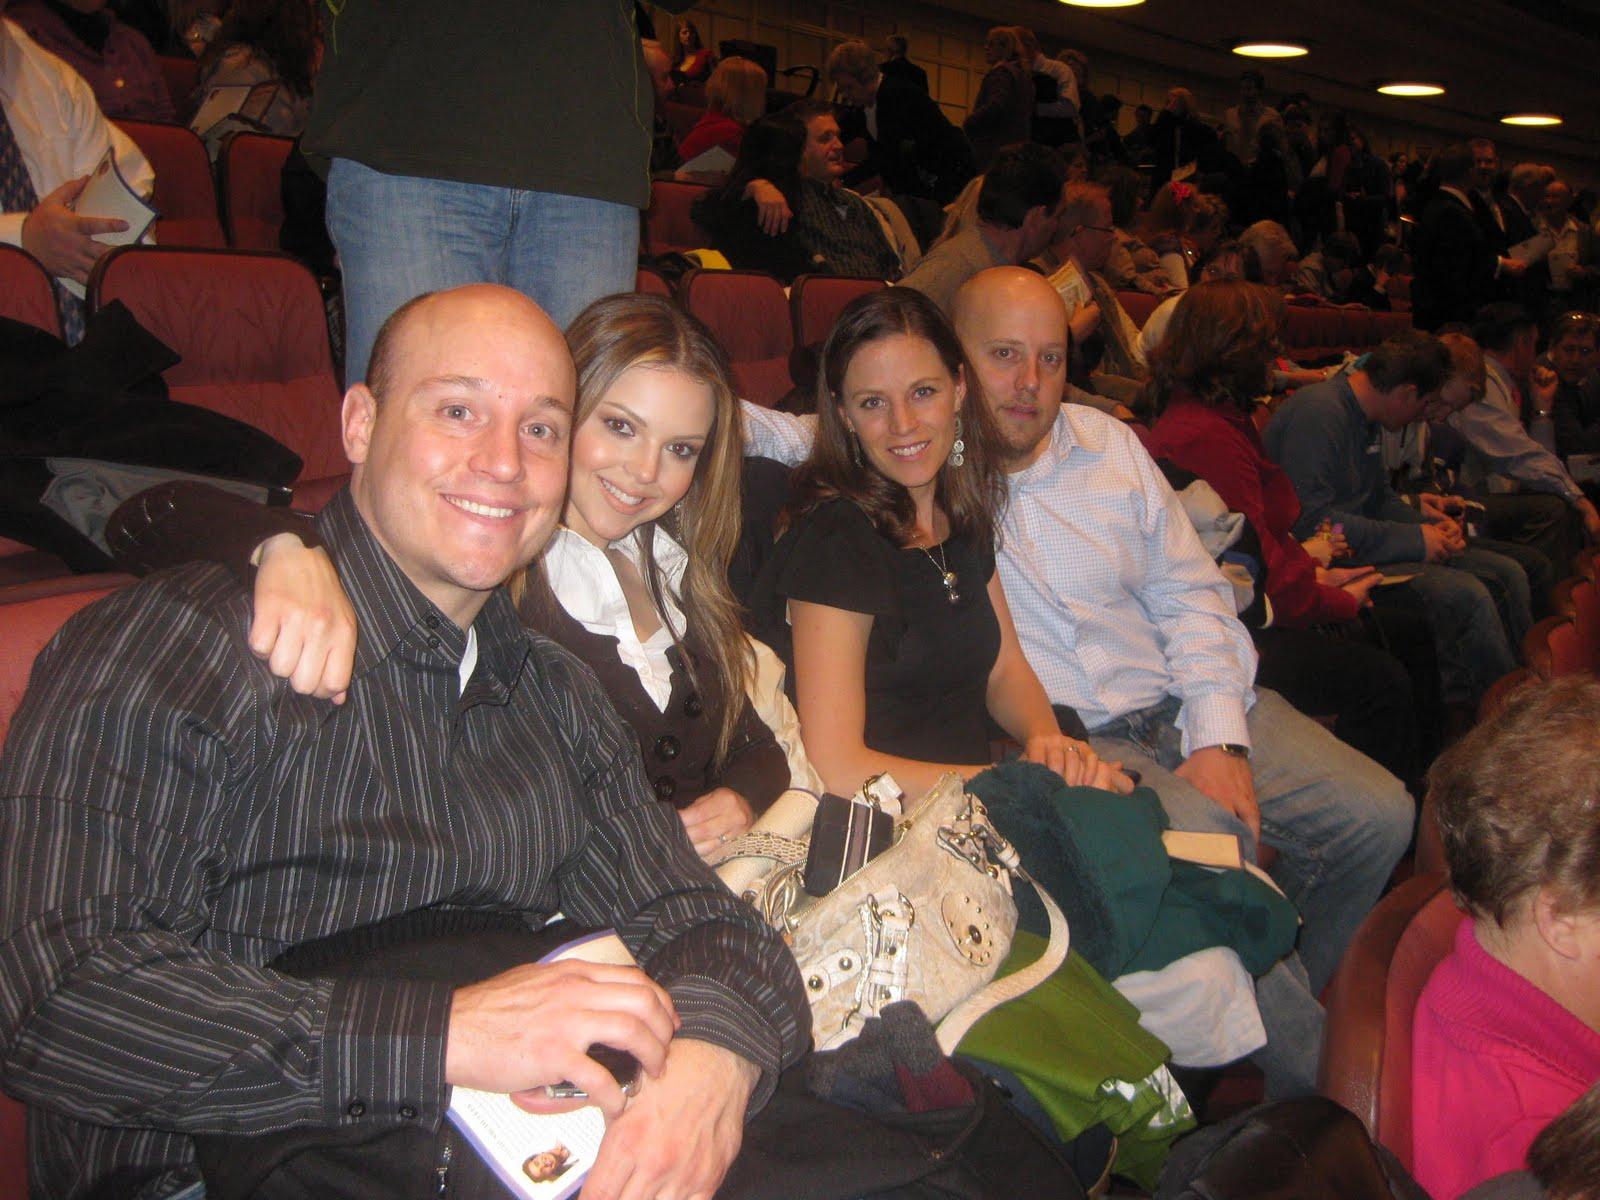 Melissa Rossiter: Mormon Tabernacle Choir Christmas Concert 2010